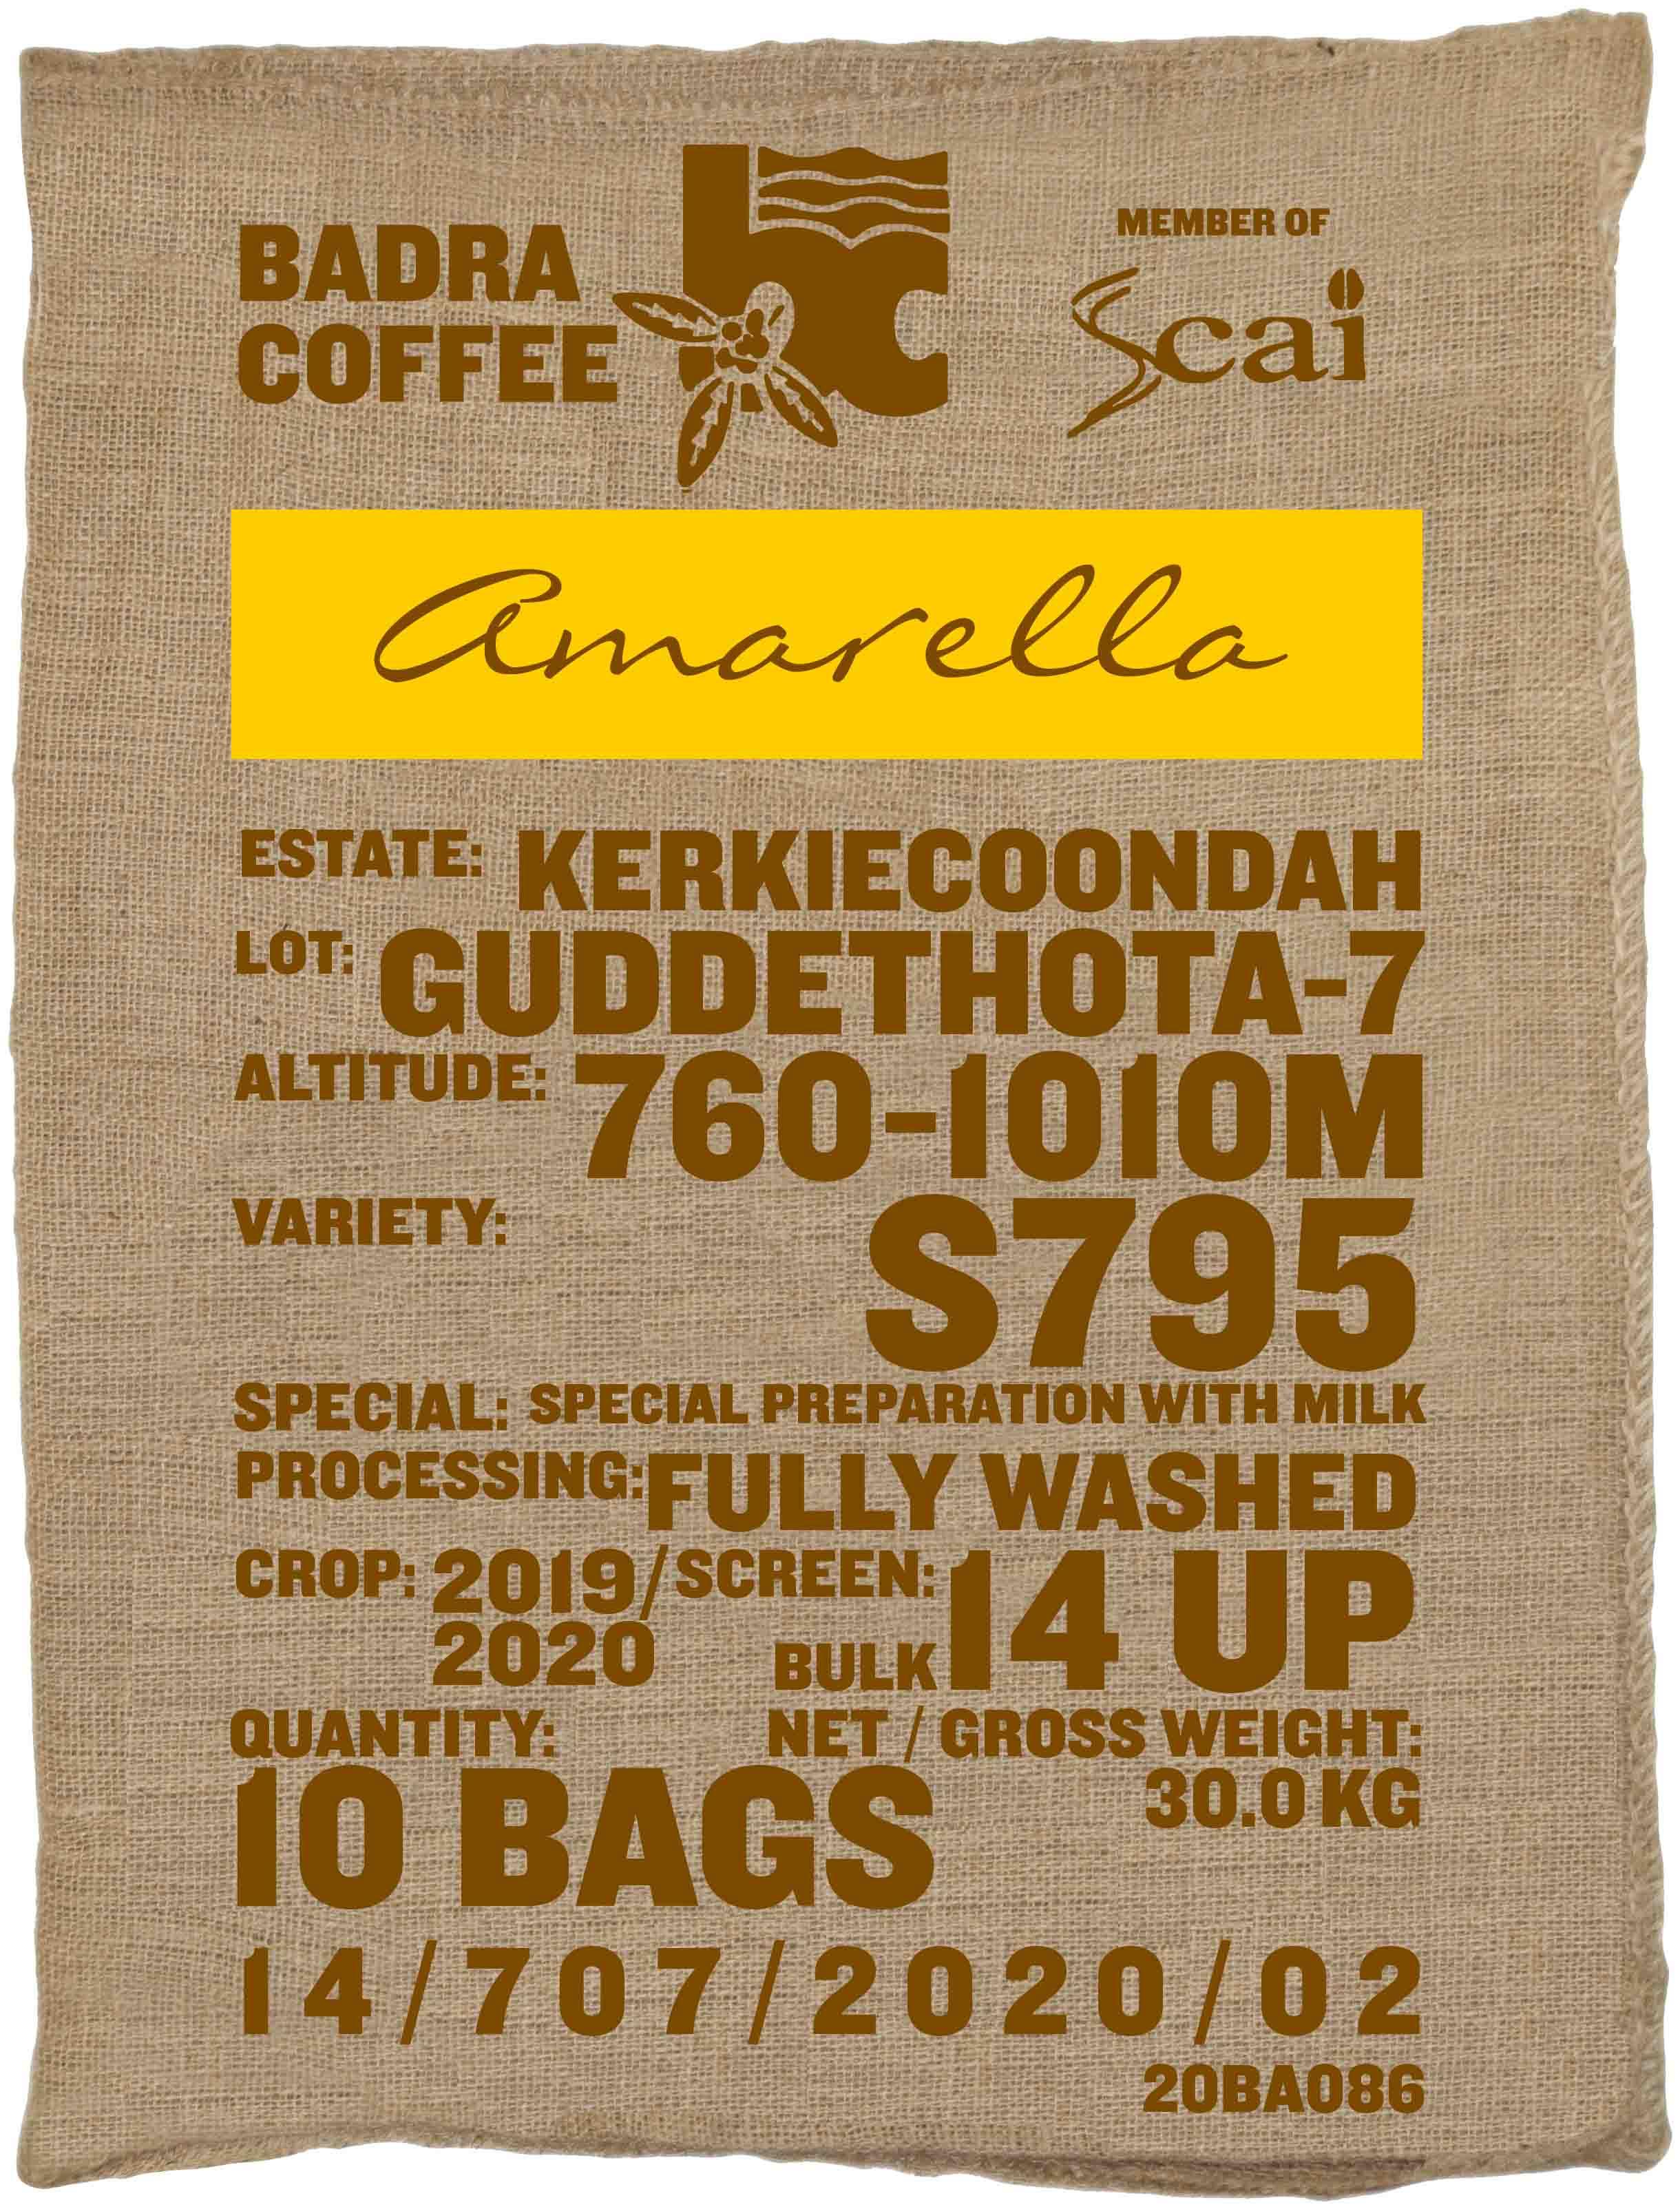 Ein Rohkaffeesack amarella Parzellenkaffee Varietät S795. Badra Estates Lot Guddethota 7.